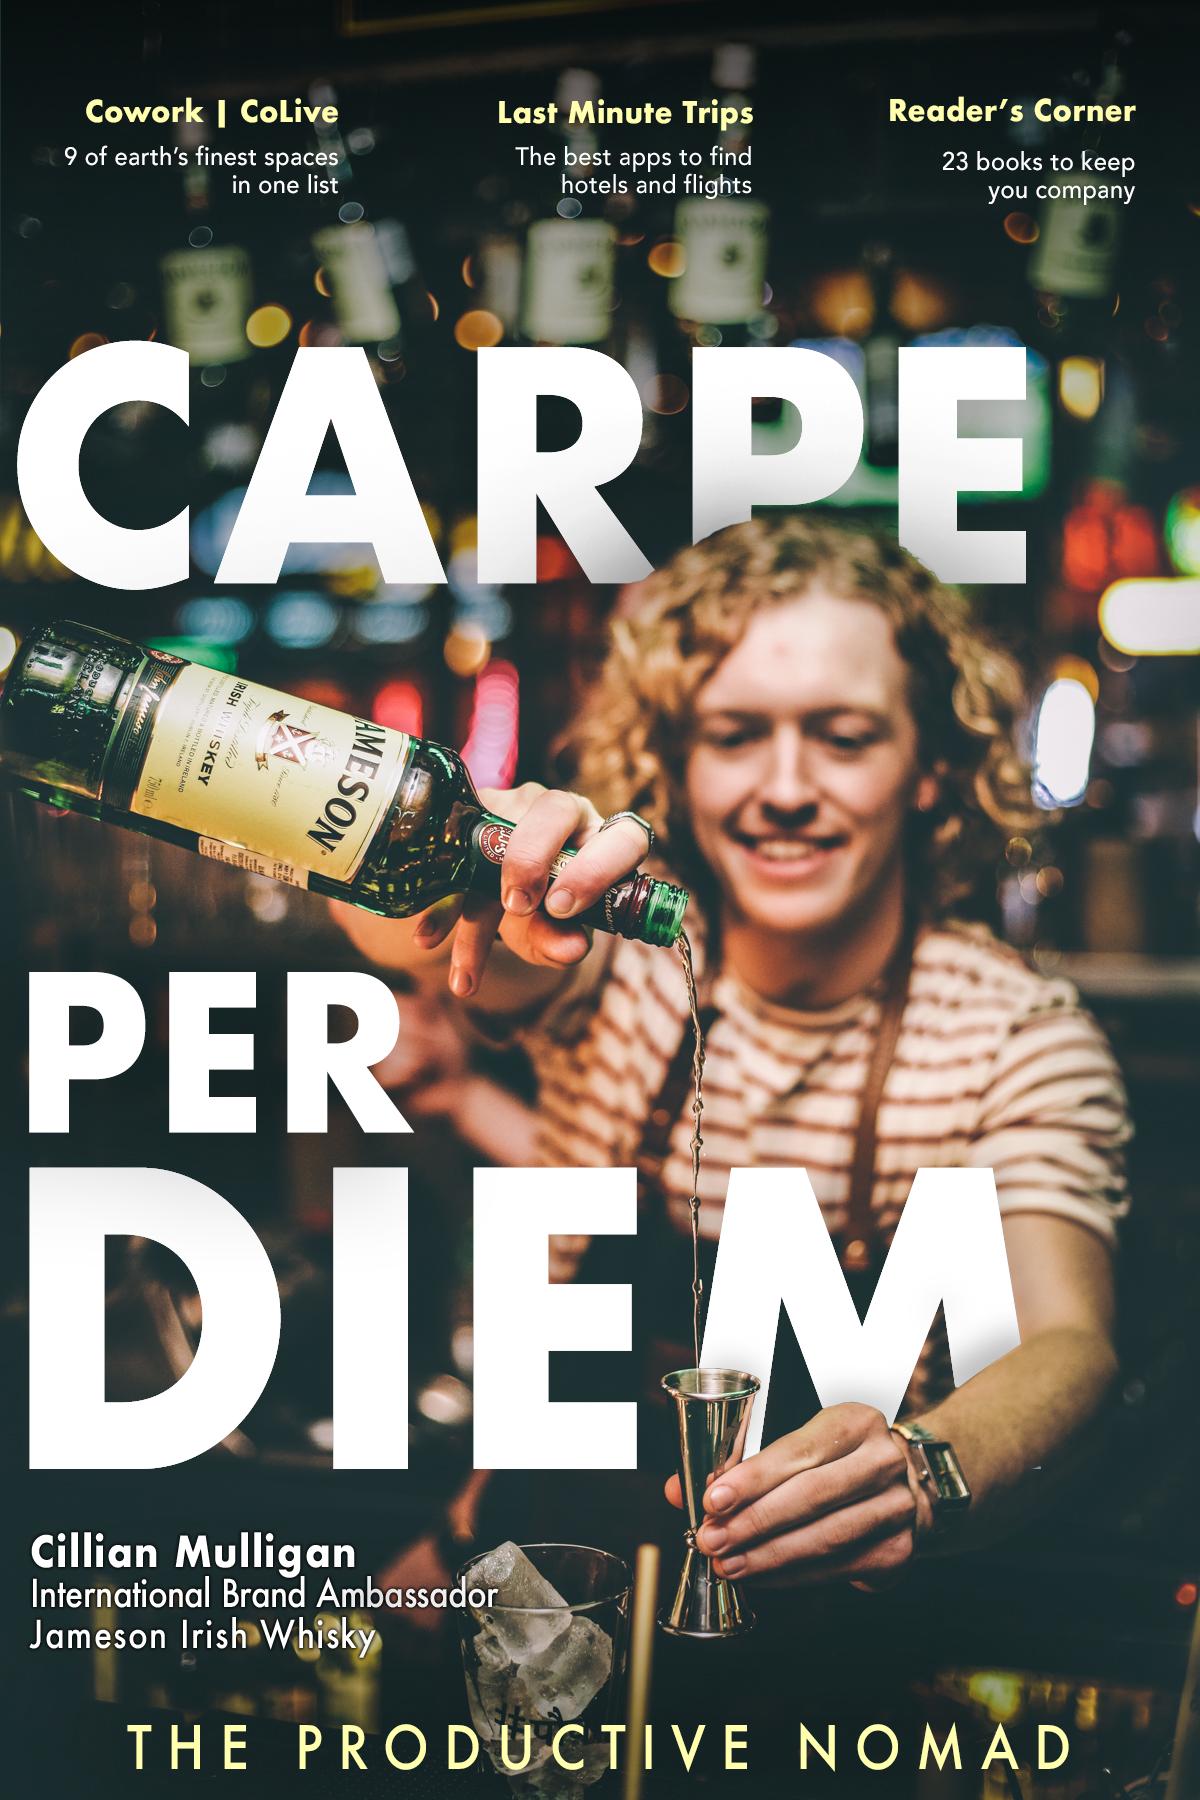 CarpePerDiem February 2019